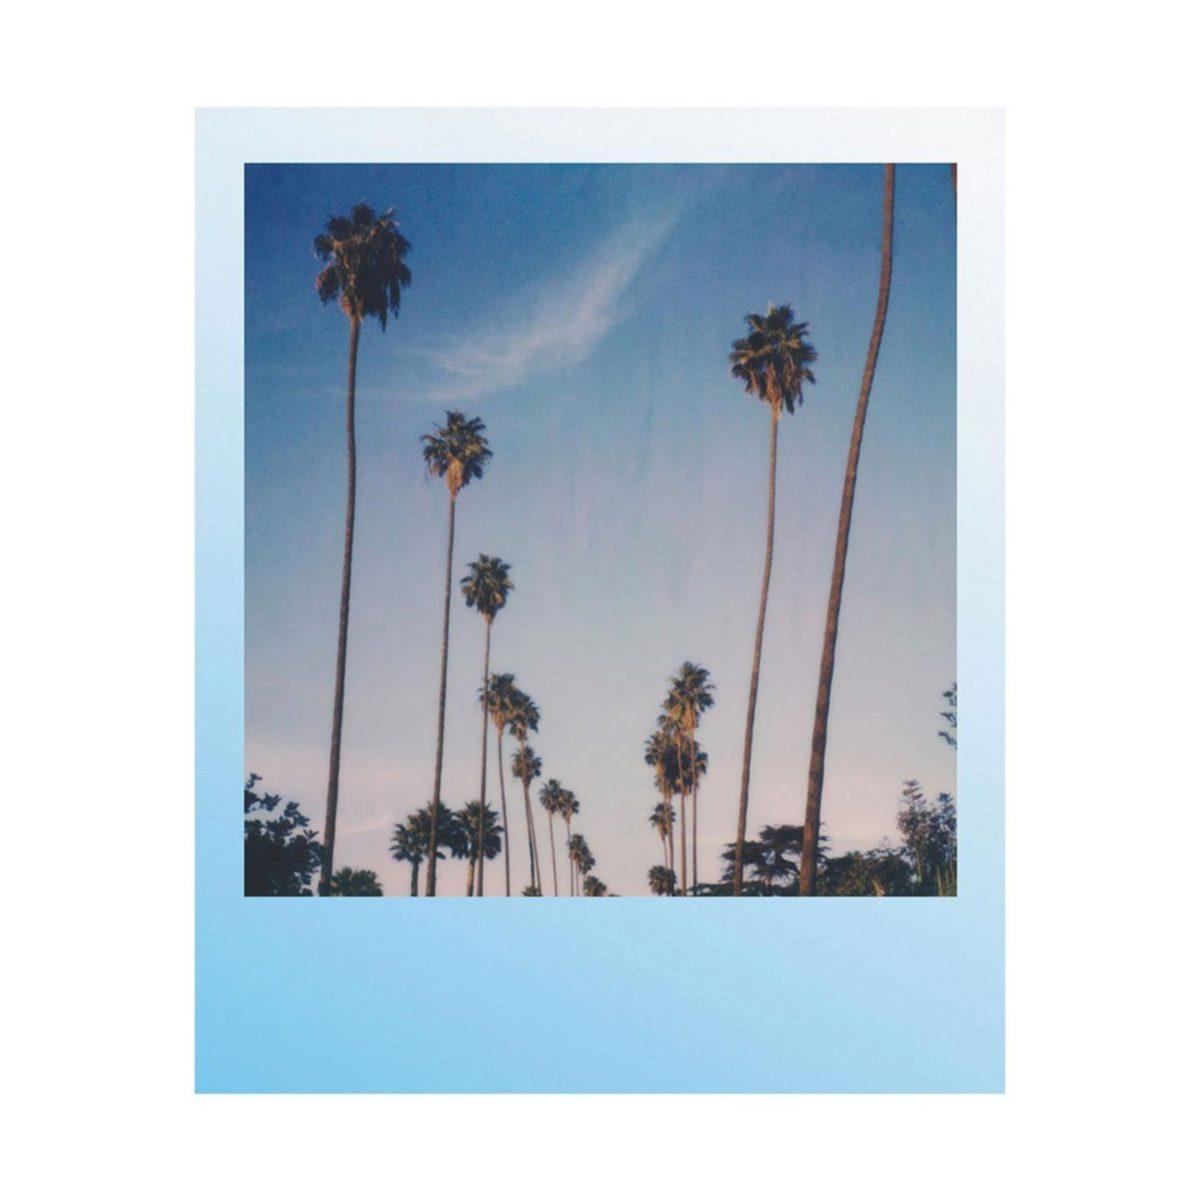 polaroid_i_type_color_film_summer_blues_03